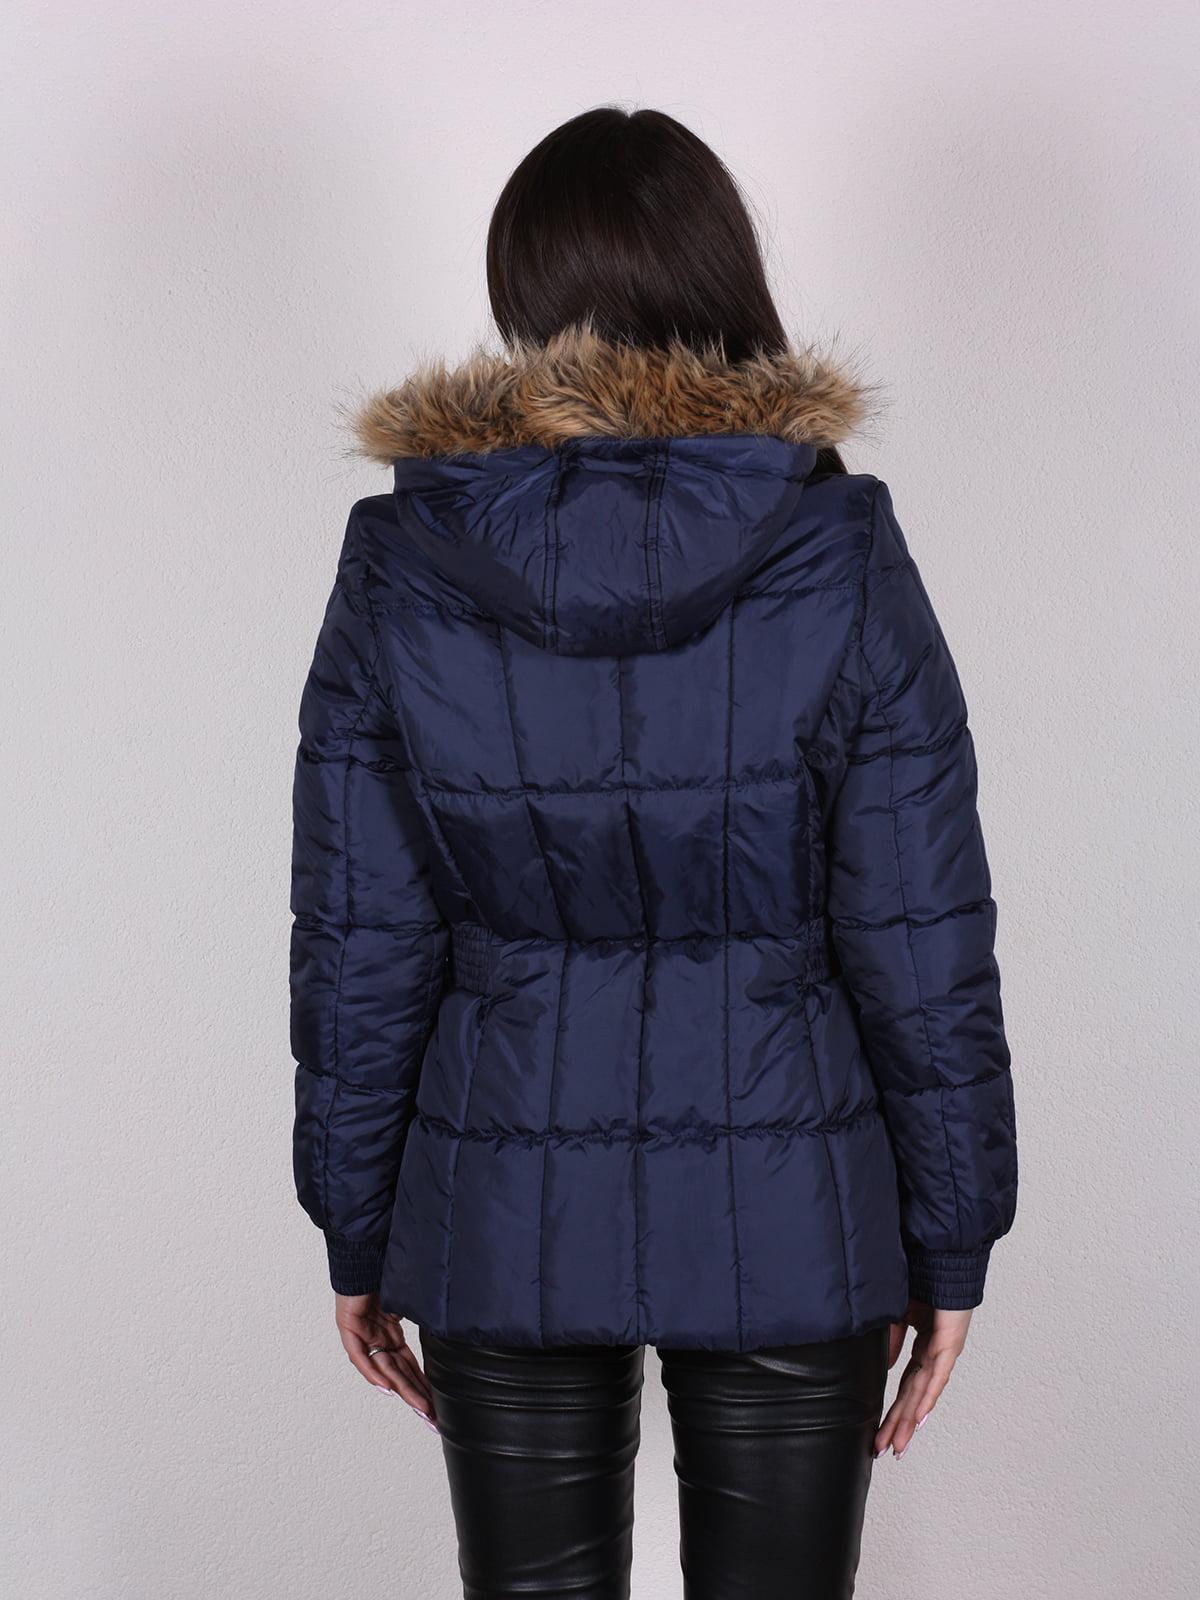 Куртка темно-синяя   4922487   фото 4